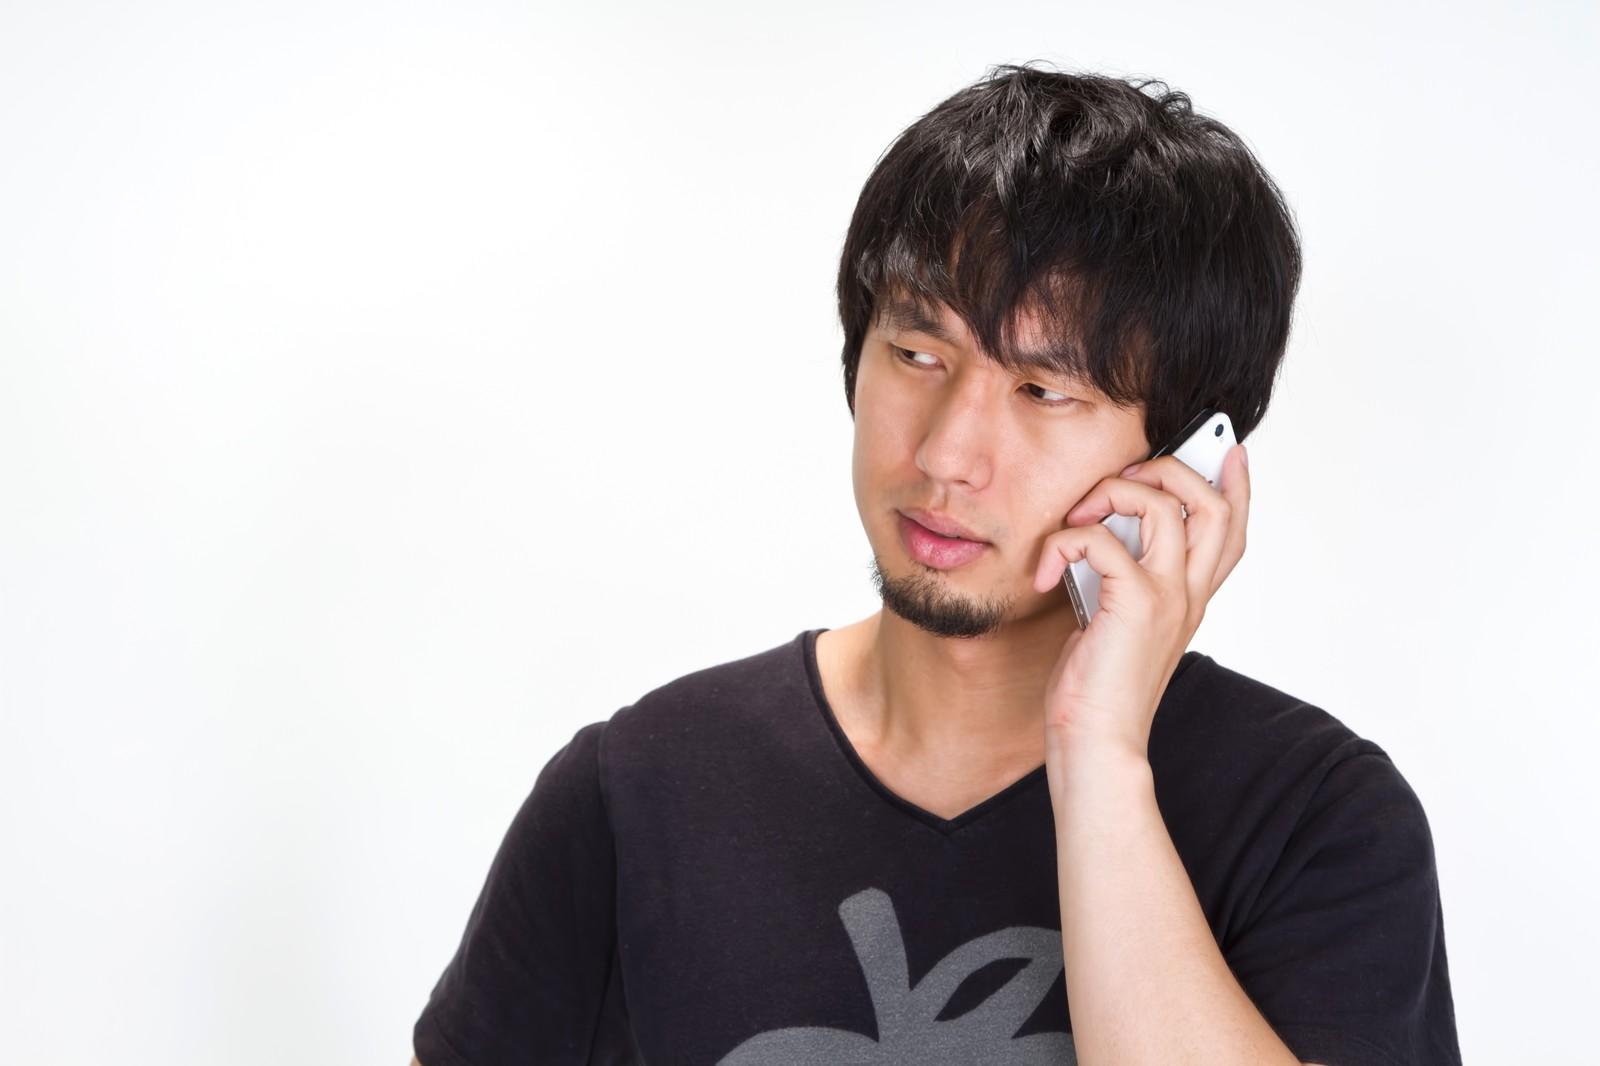 N912_denwagoshidemajigire_TP_V